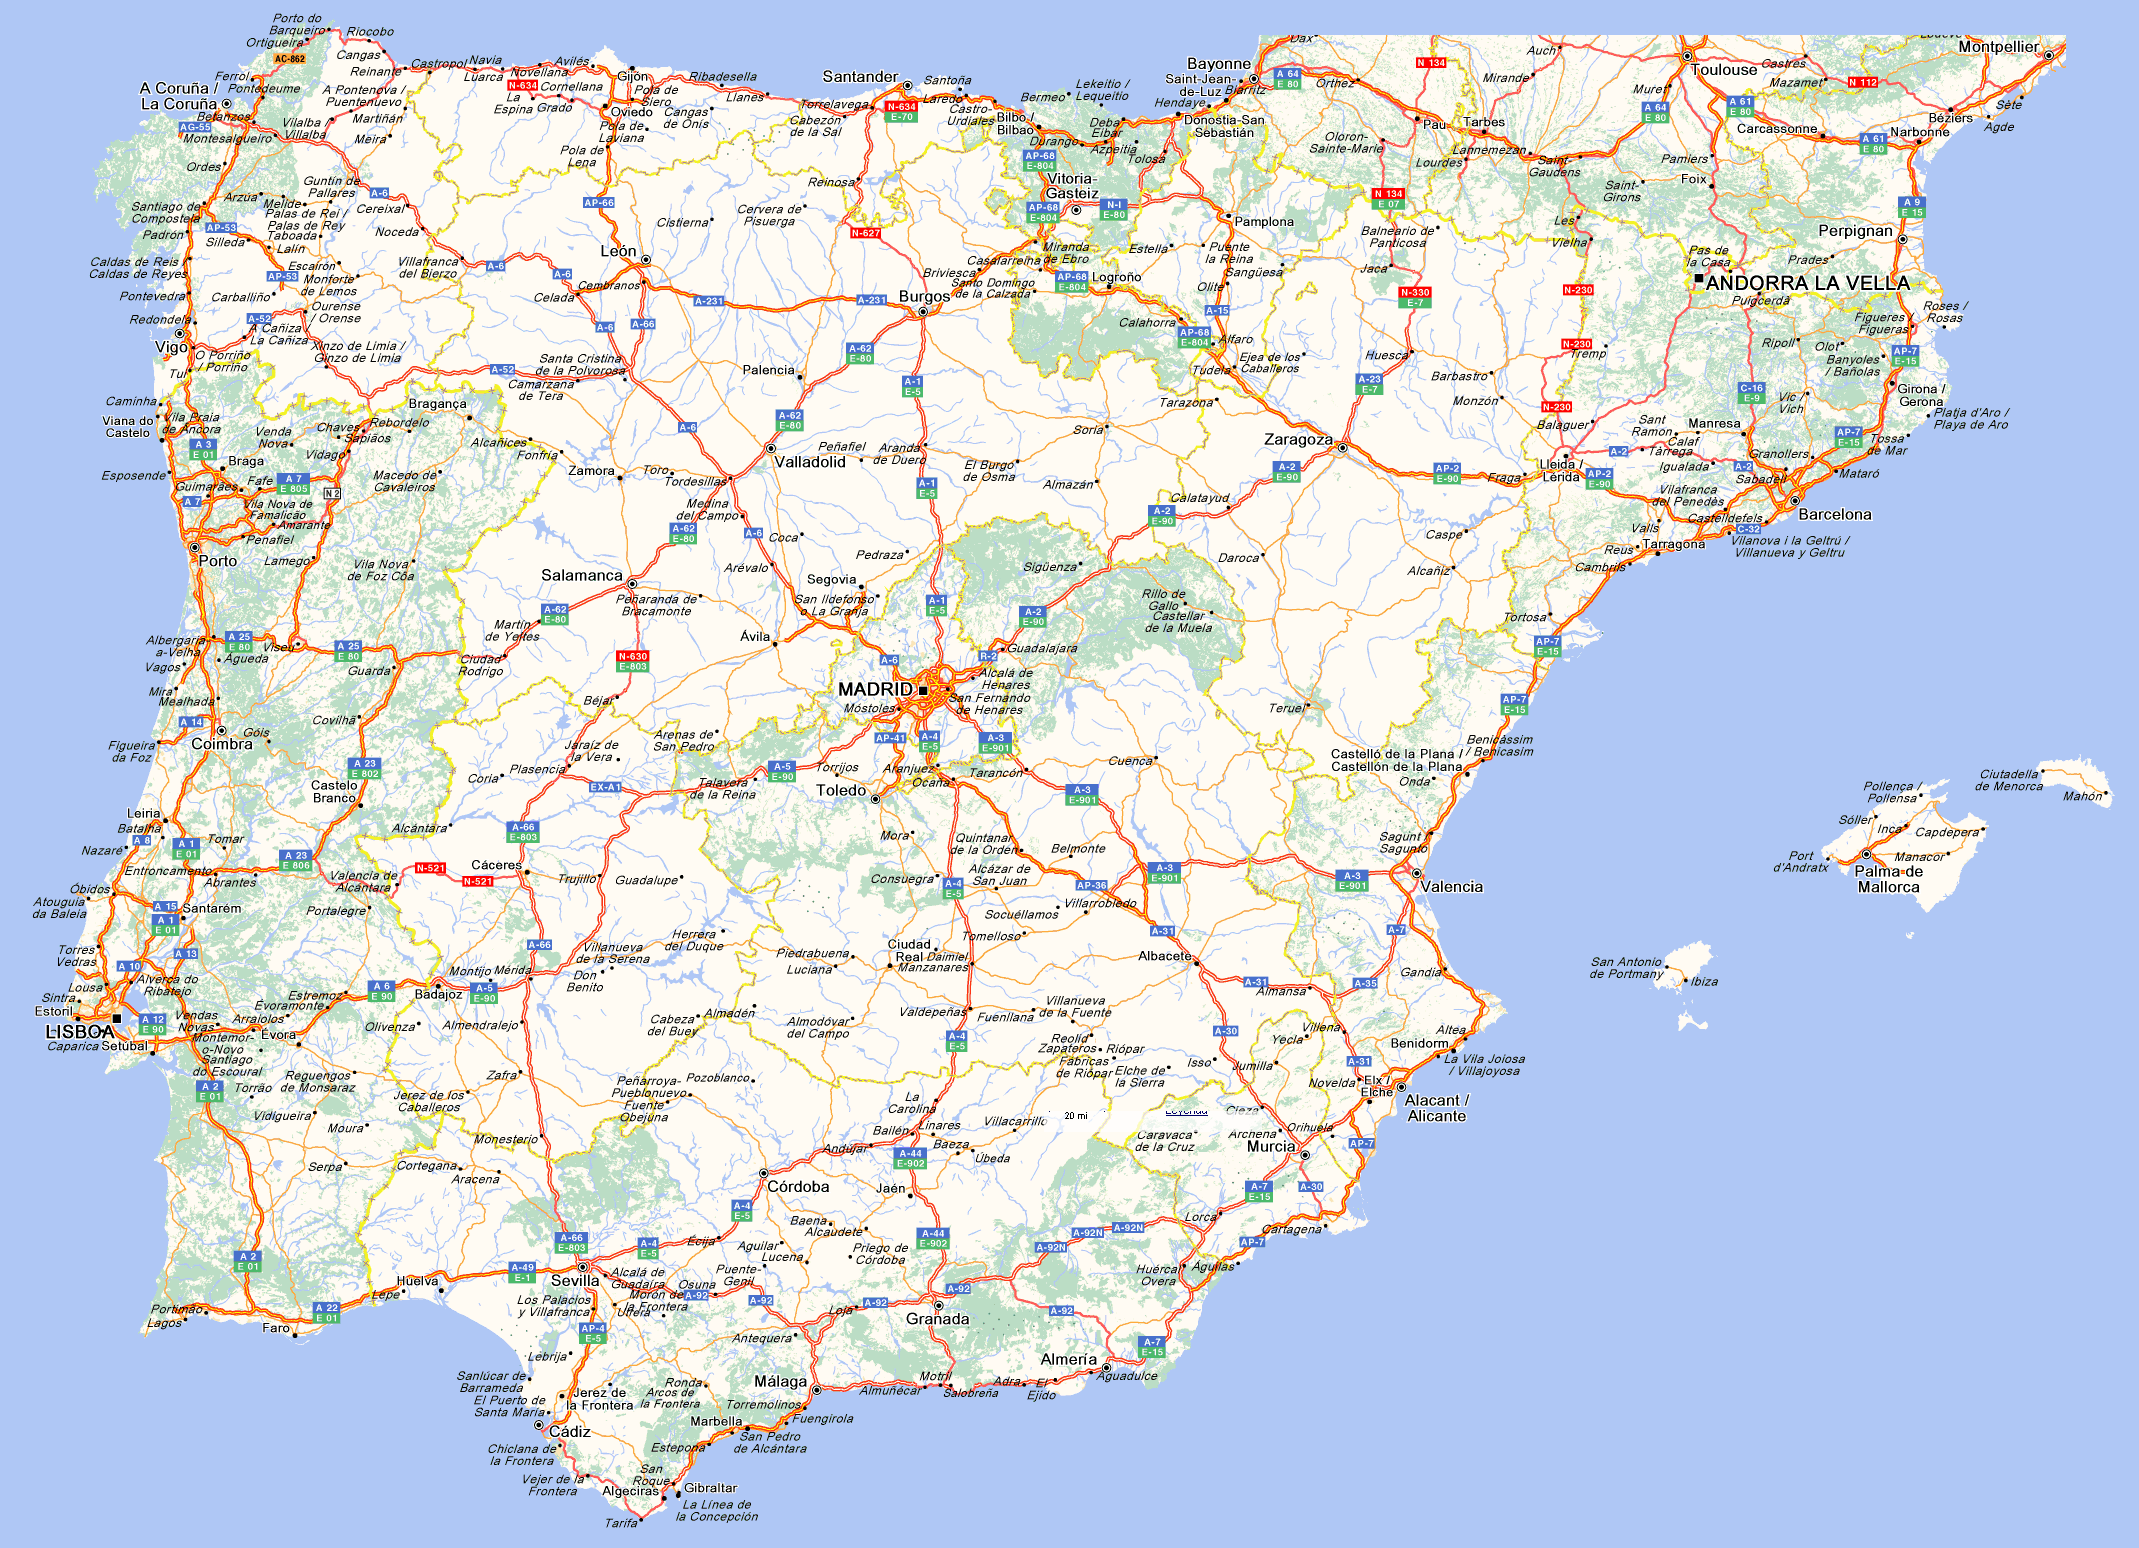 MapadeCarreterasdeEspanayPortugal Podemos